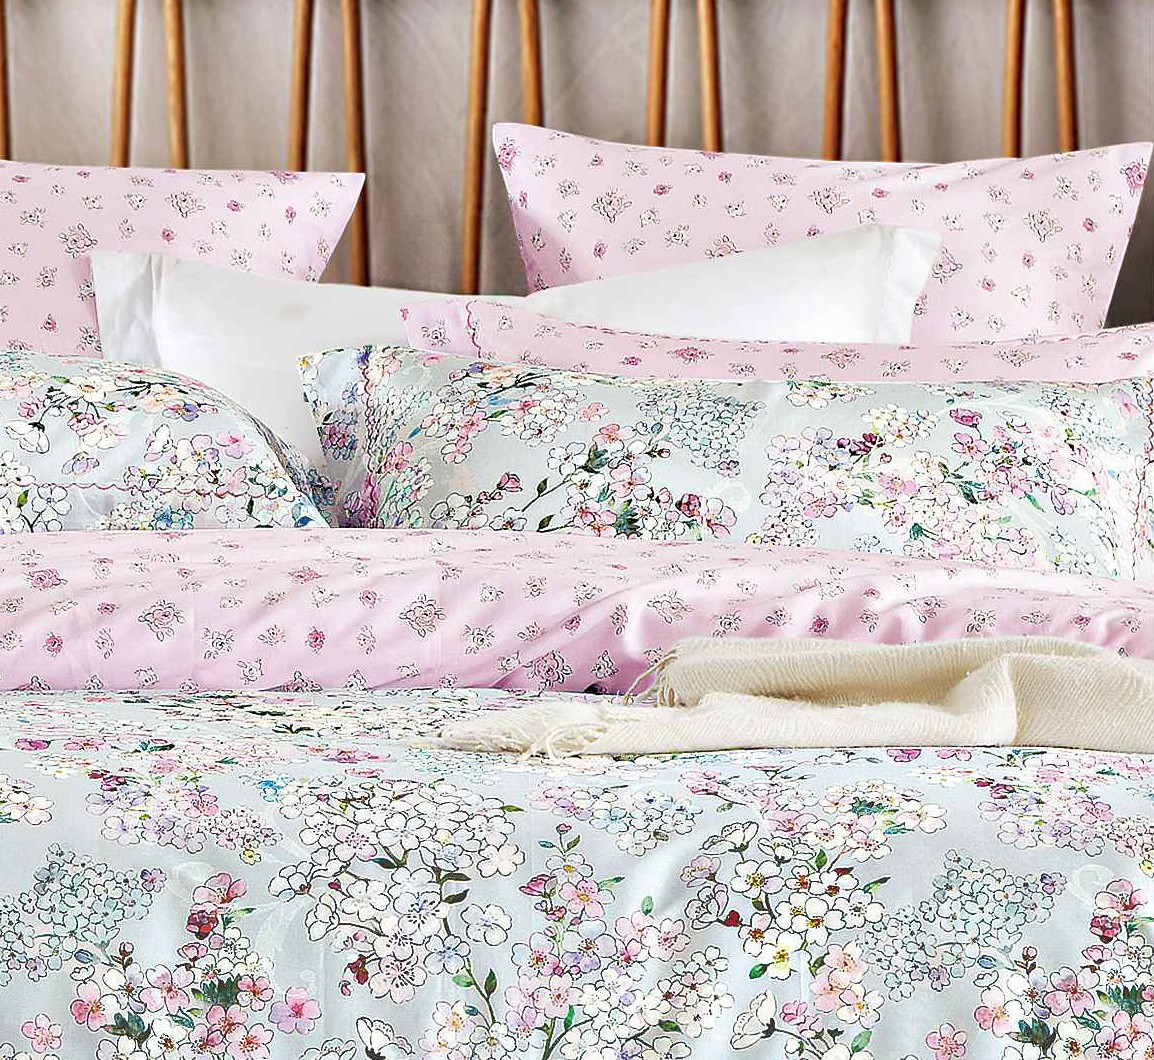 plaid elegant embroidery bedroom Cotton Bedding Sets Daphne